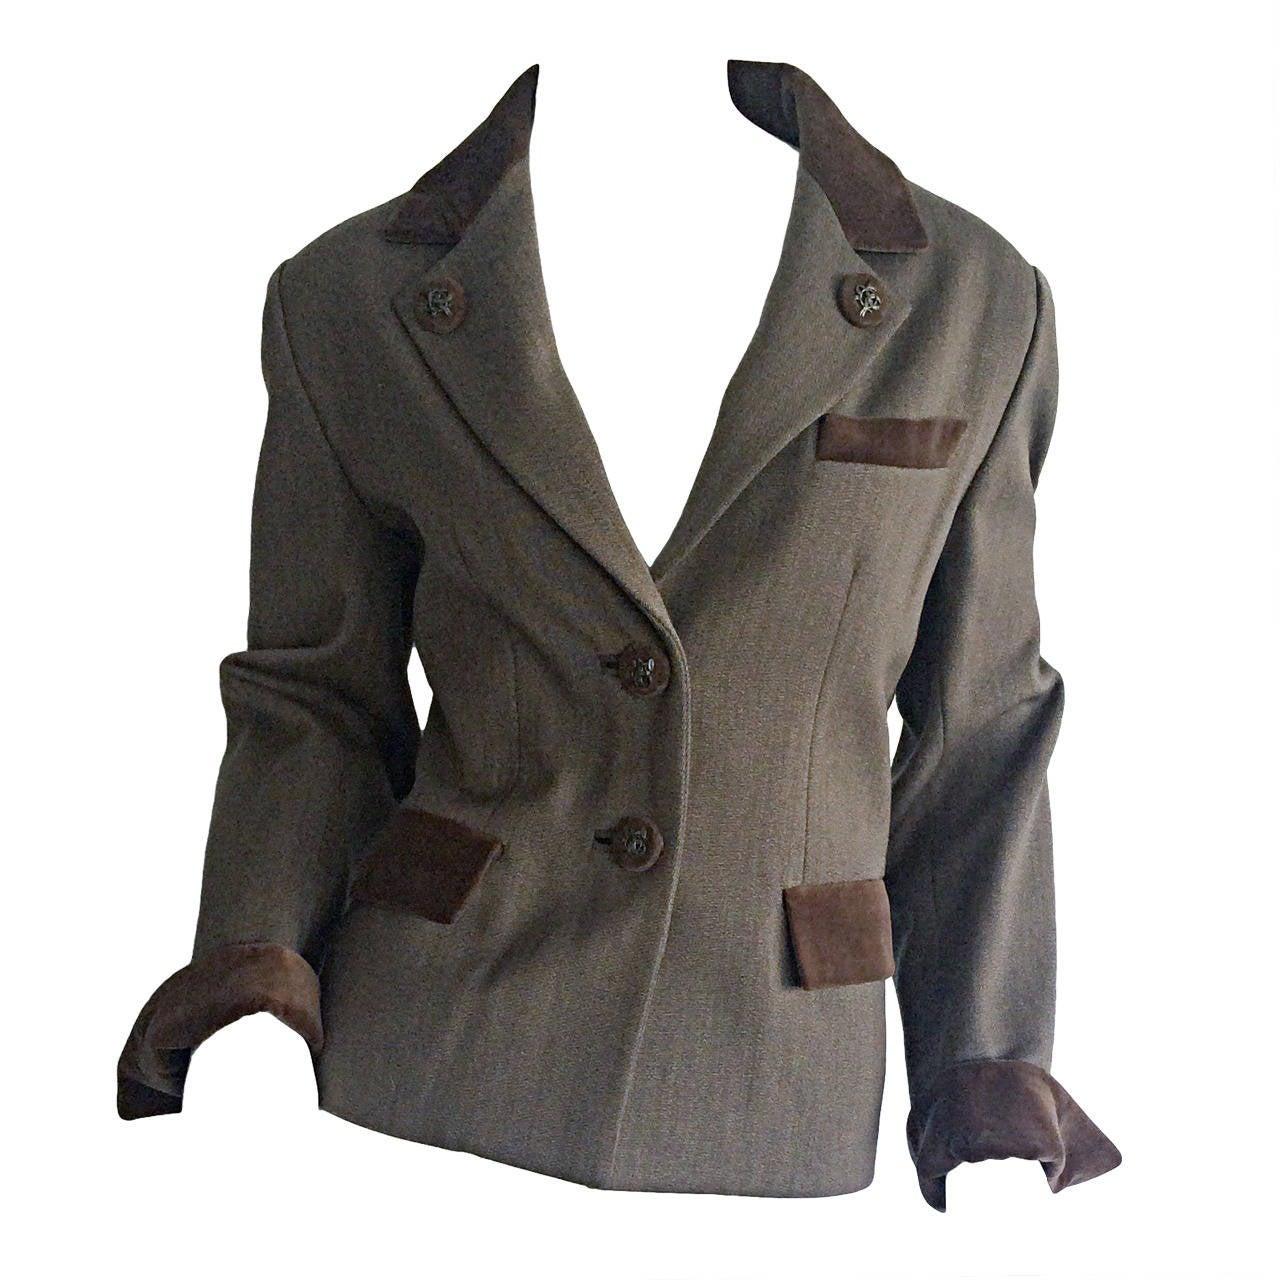 Vintage Riding Jacket 100